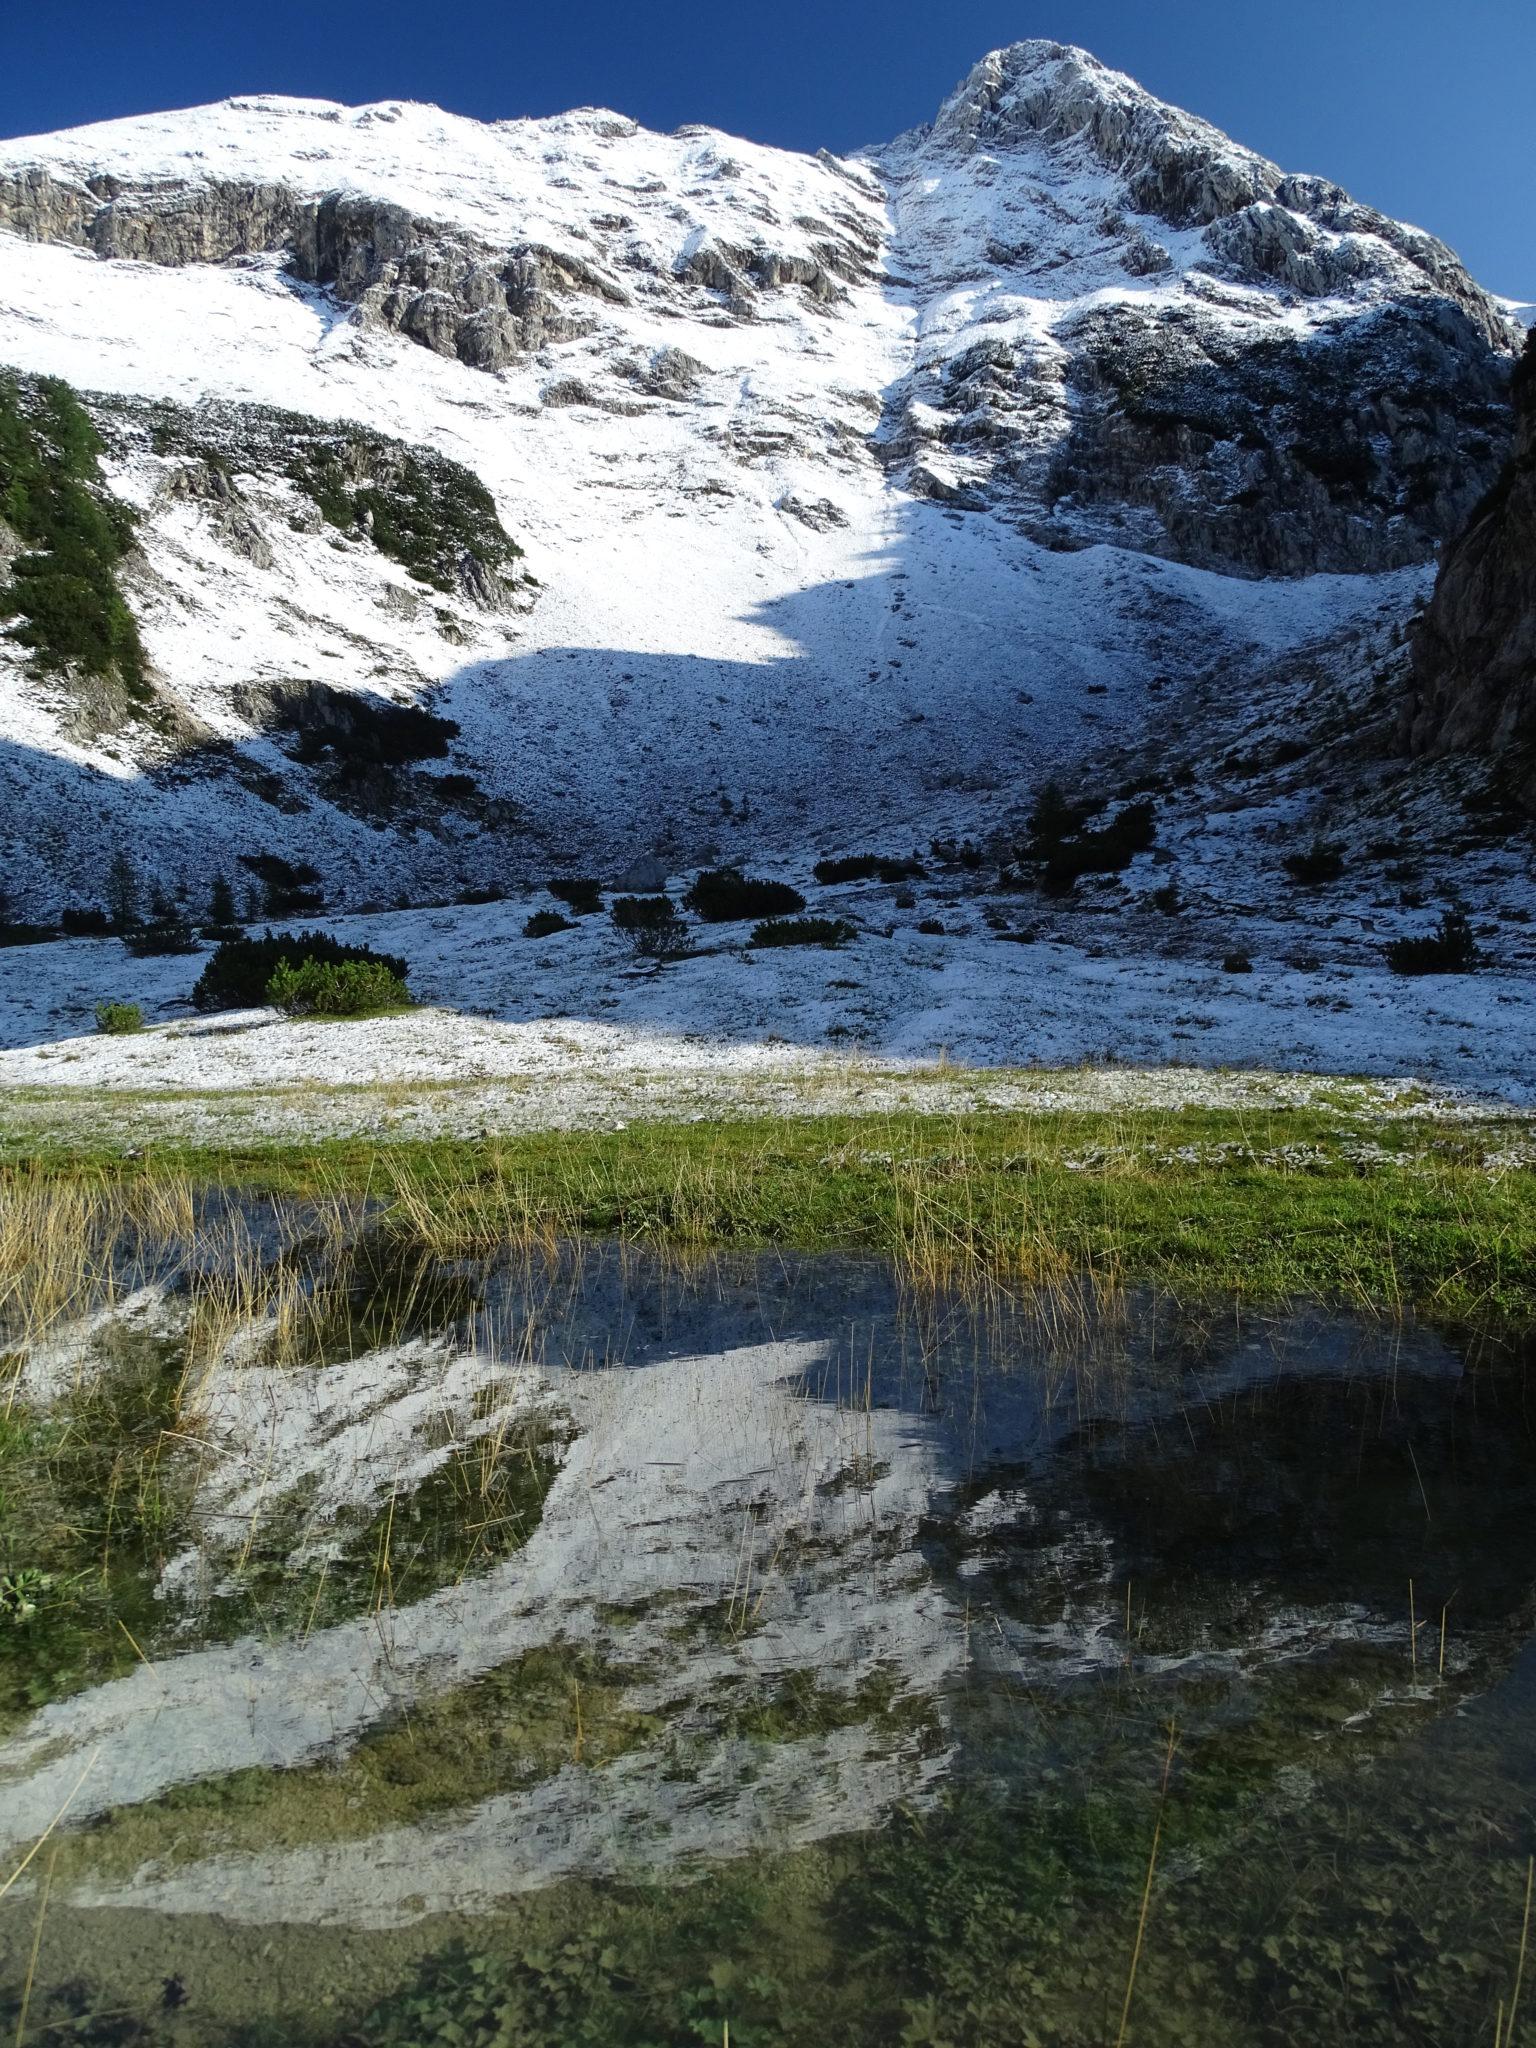 Mali Draški Vrh, 2,132 m